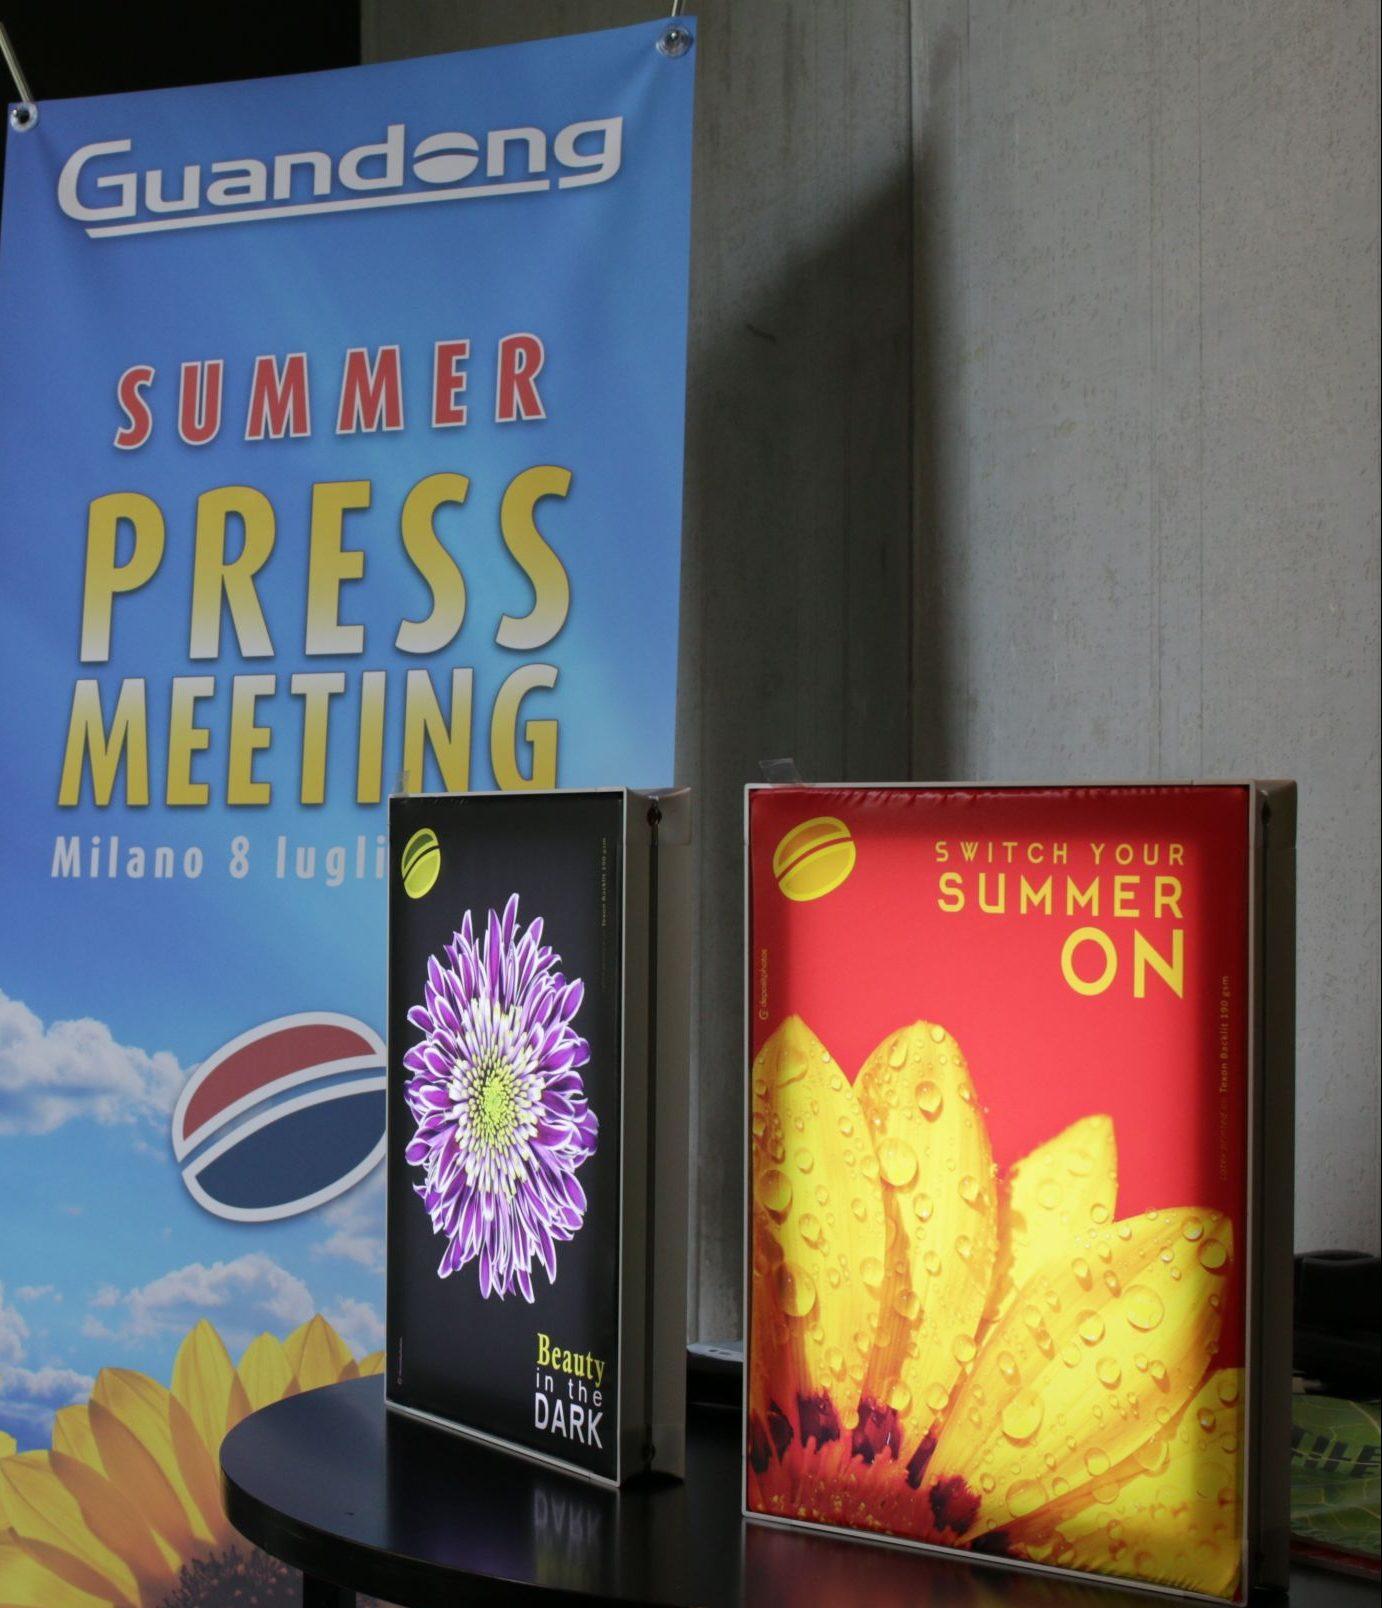 https://www.promotionmagazine.it/wp/wp-content/uploads/2016/07/Guandong_Spot-Déco_Nuova-gamma-Textile-per-retroilluminati_300dpi-e1468850550861.jpg